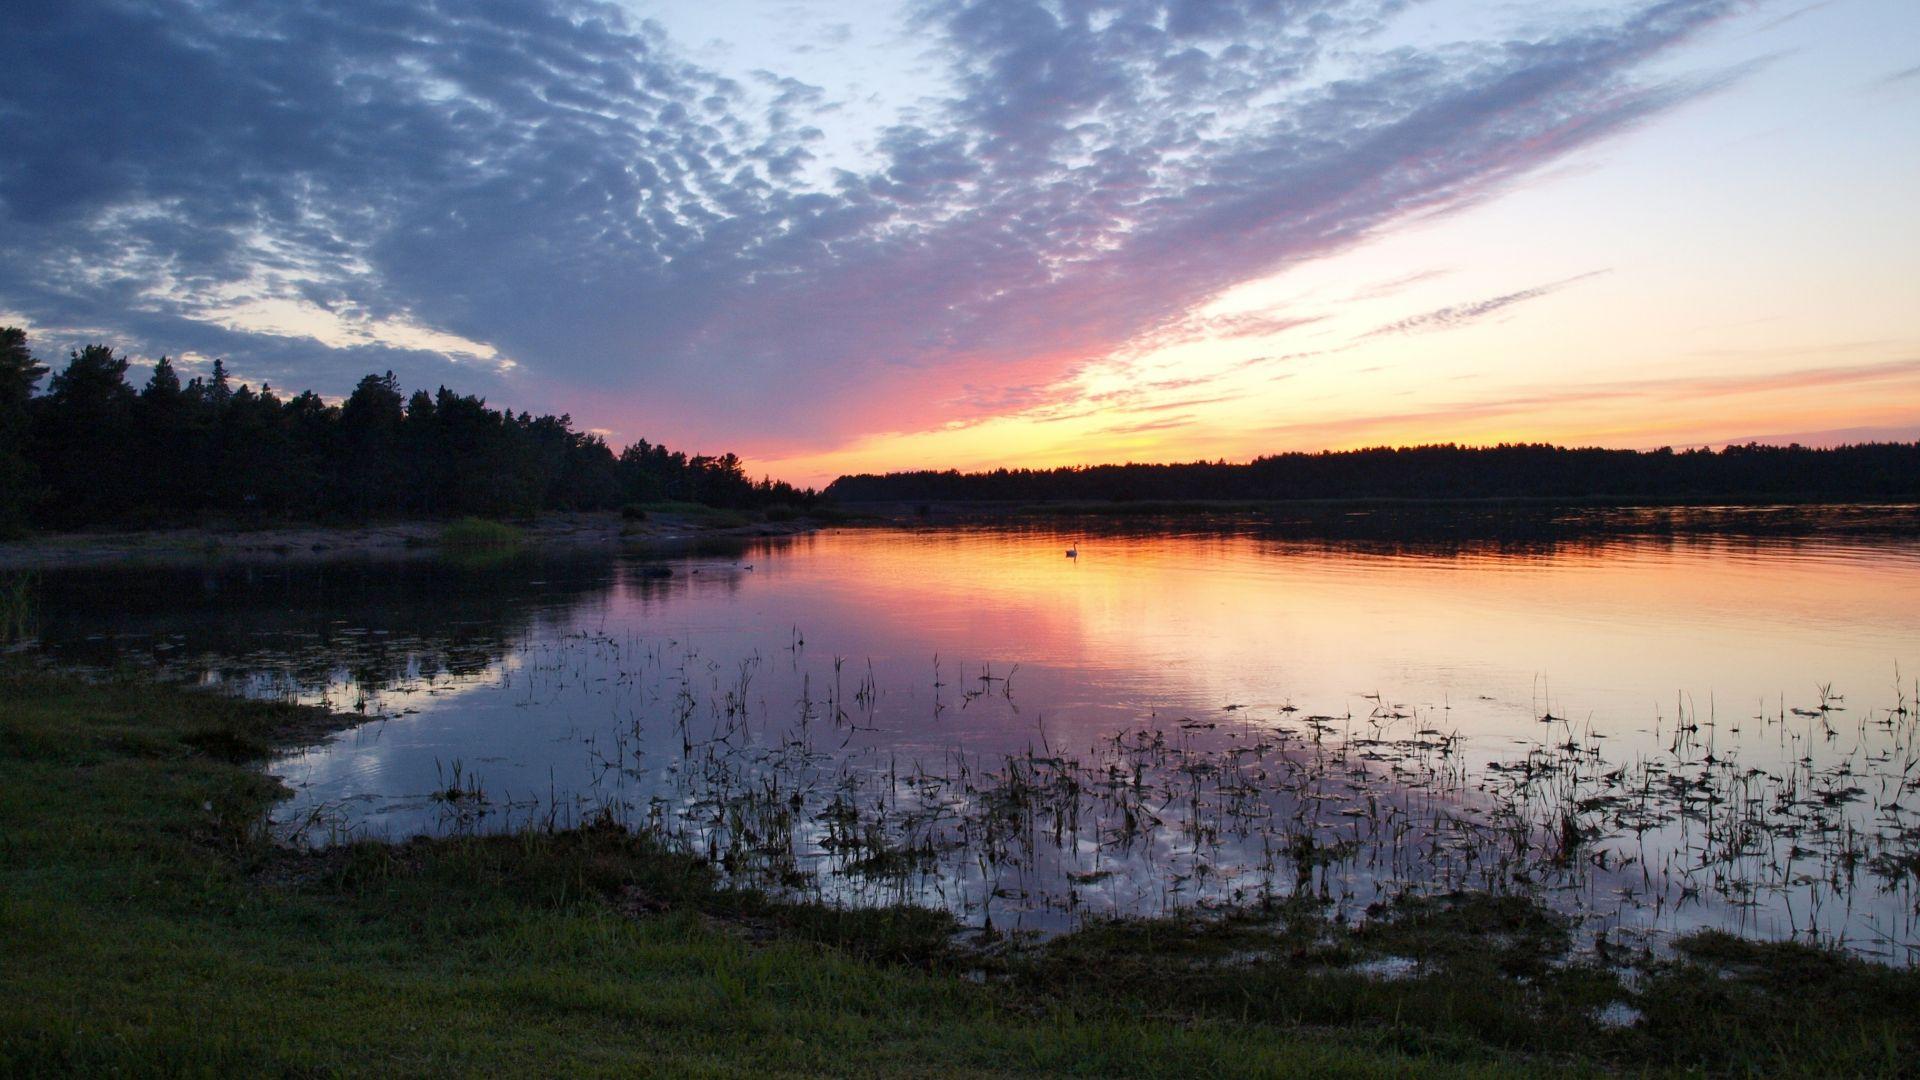 Wallpaper Evening at lake